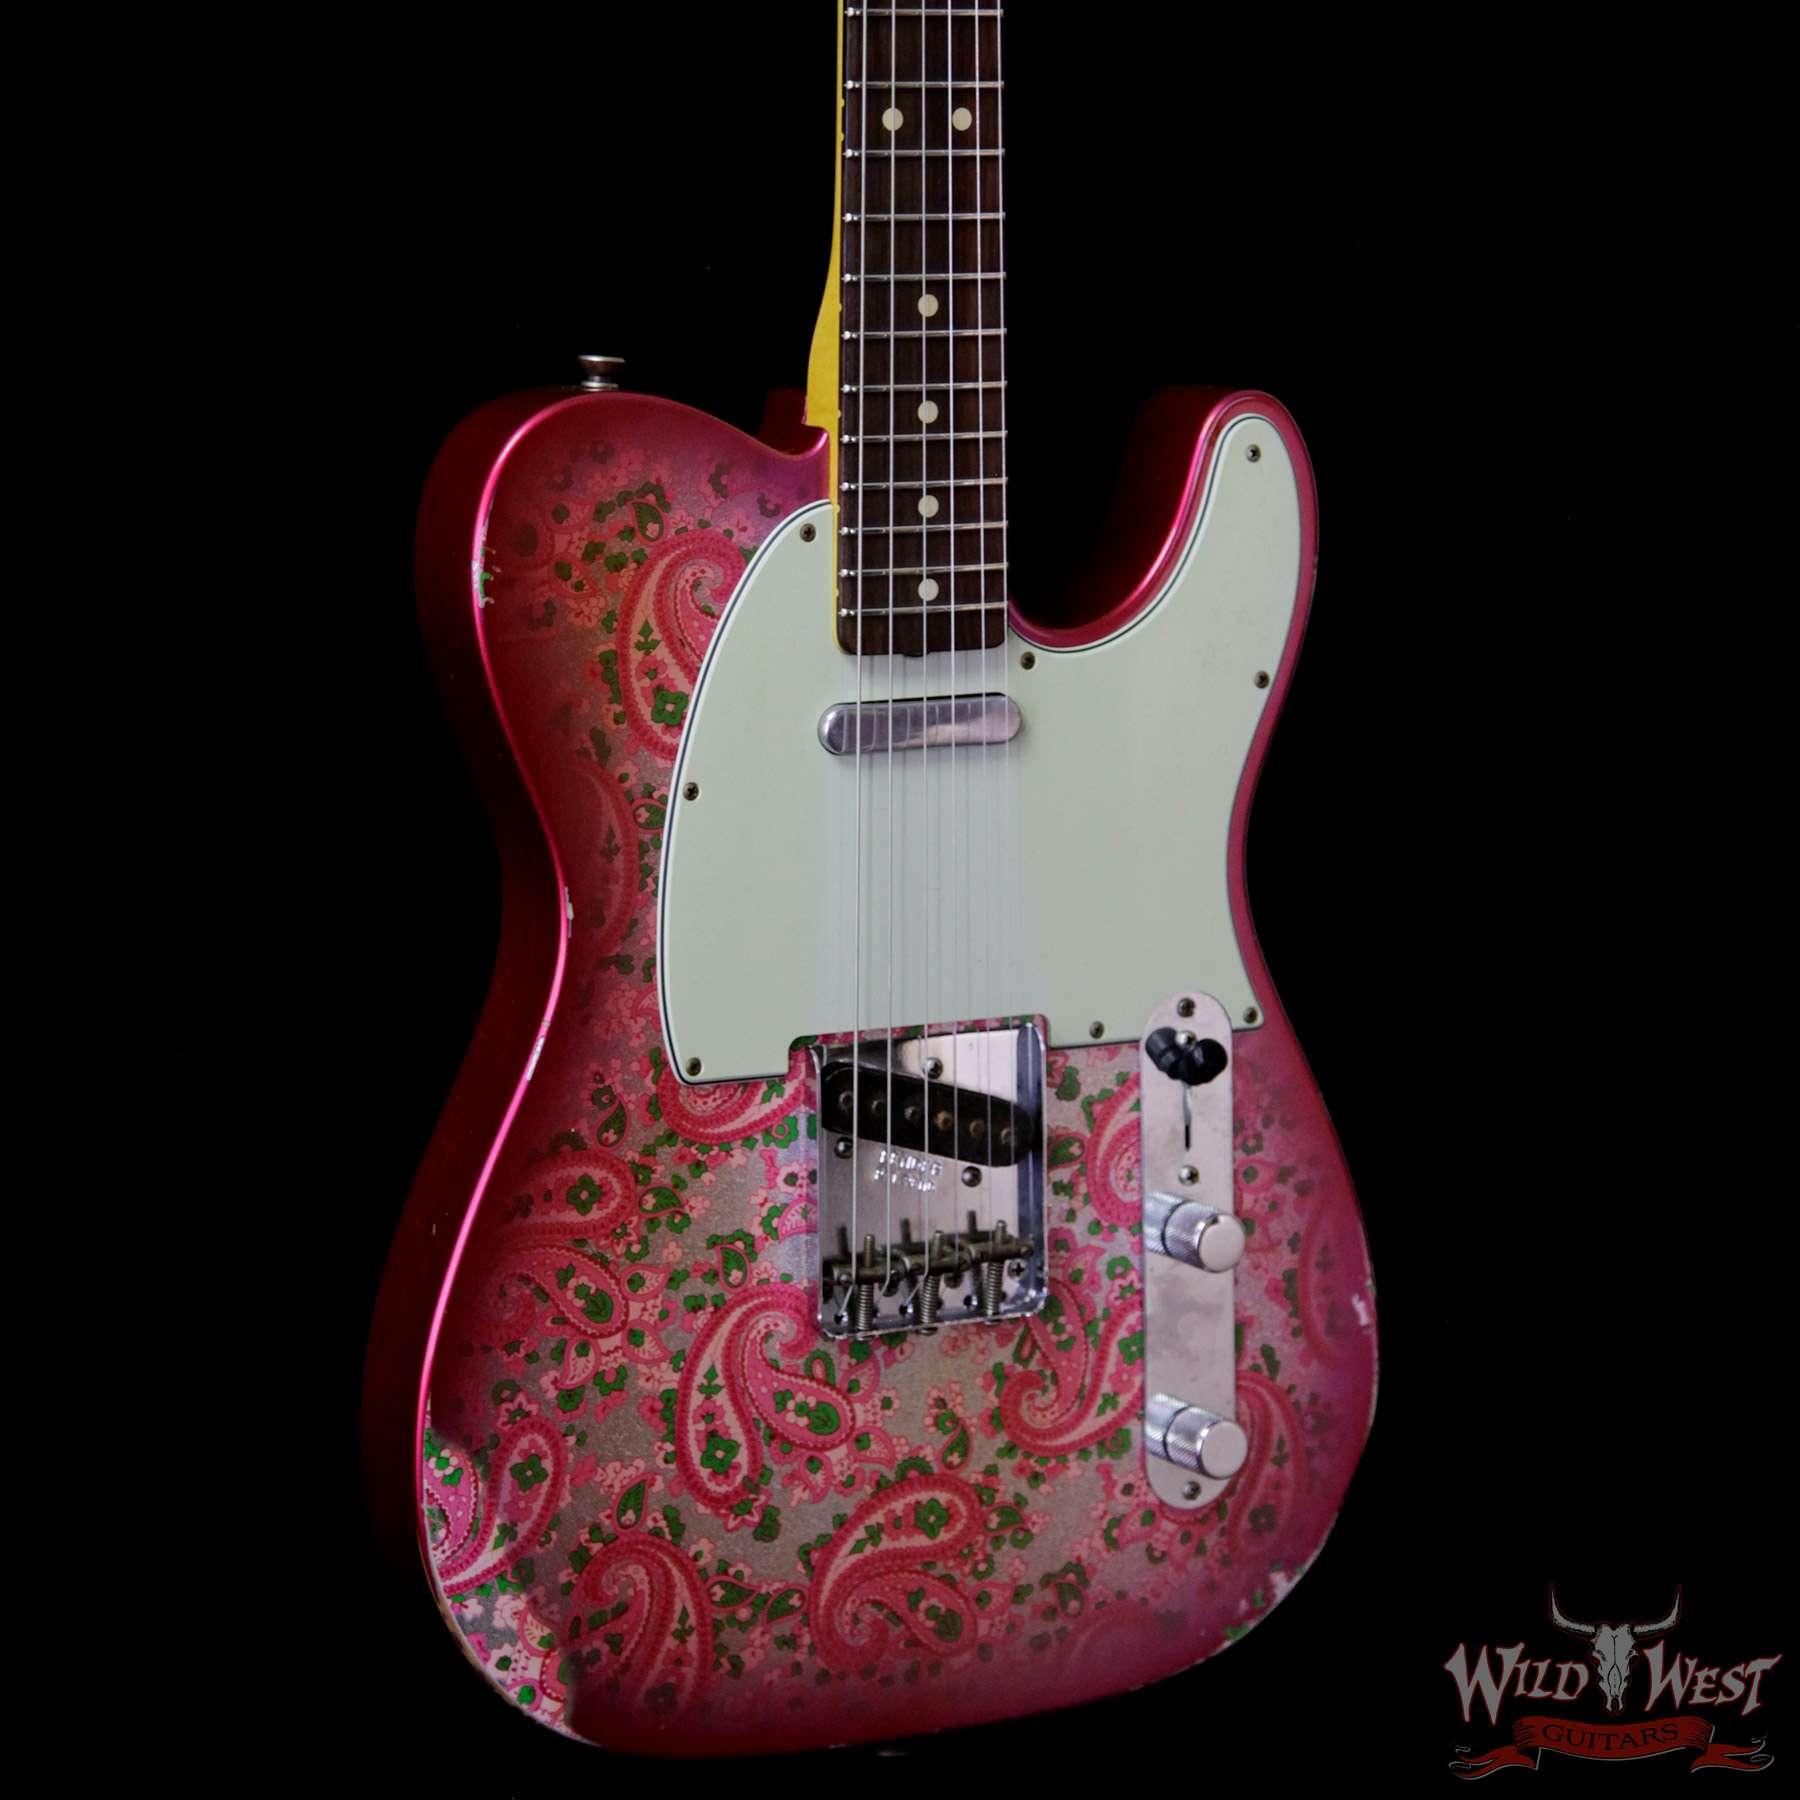 fender custom shop 1963 telecaster relic rosewood fingerboard pink paisley wild west guitars. Black Bedroom Furniture Sets. Home Design Ideas